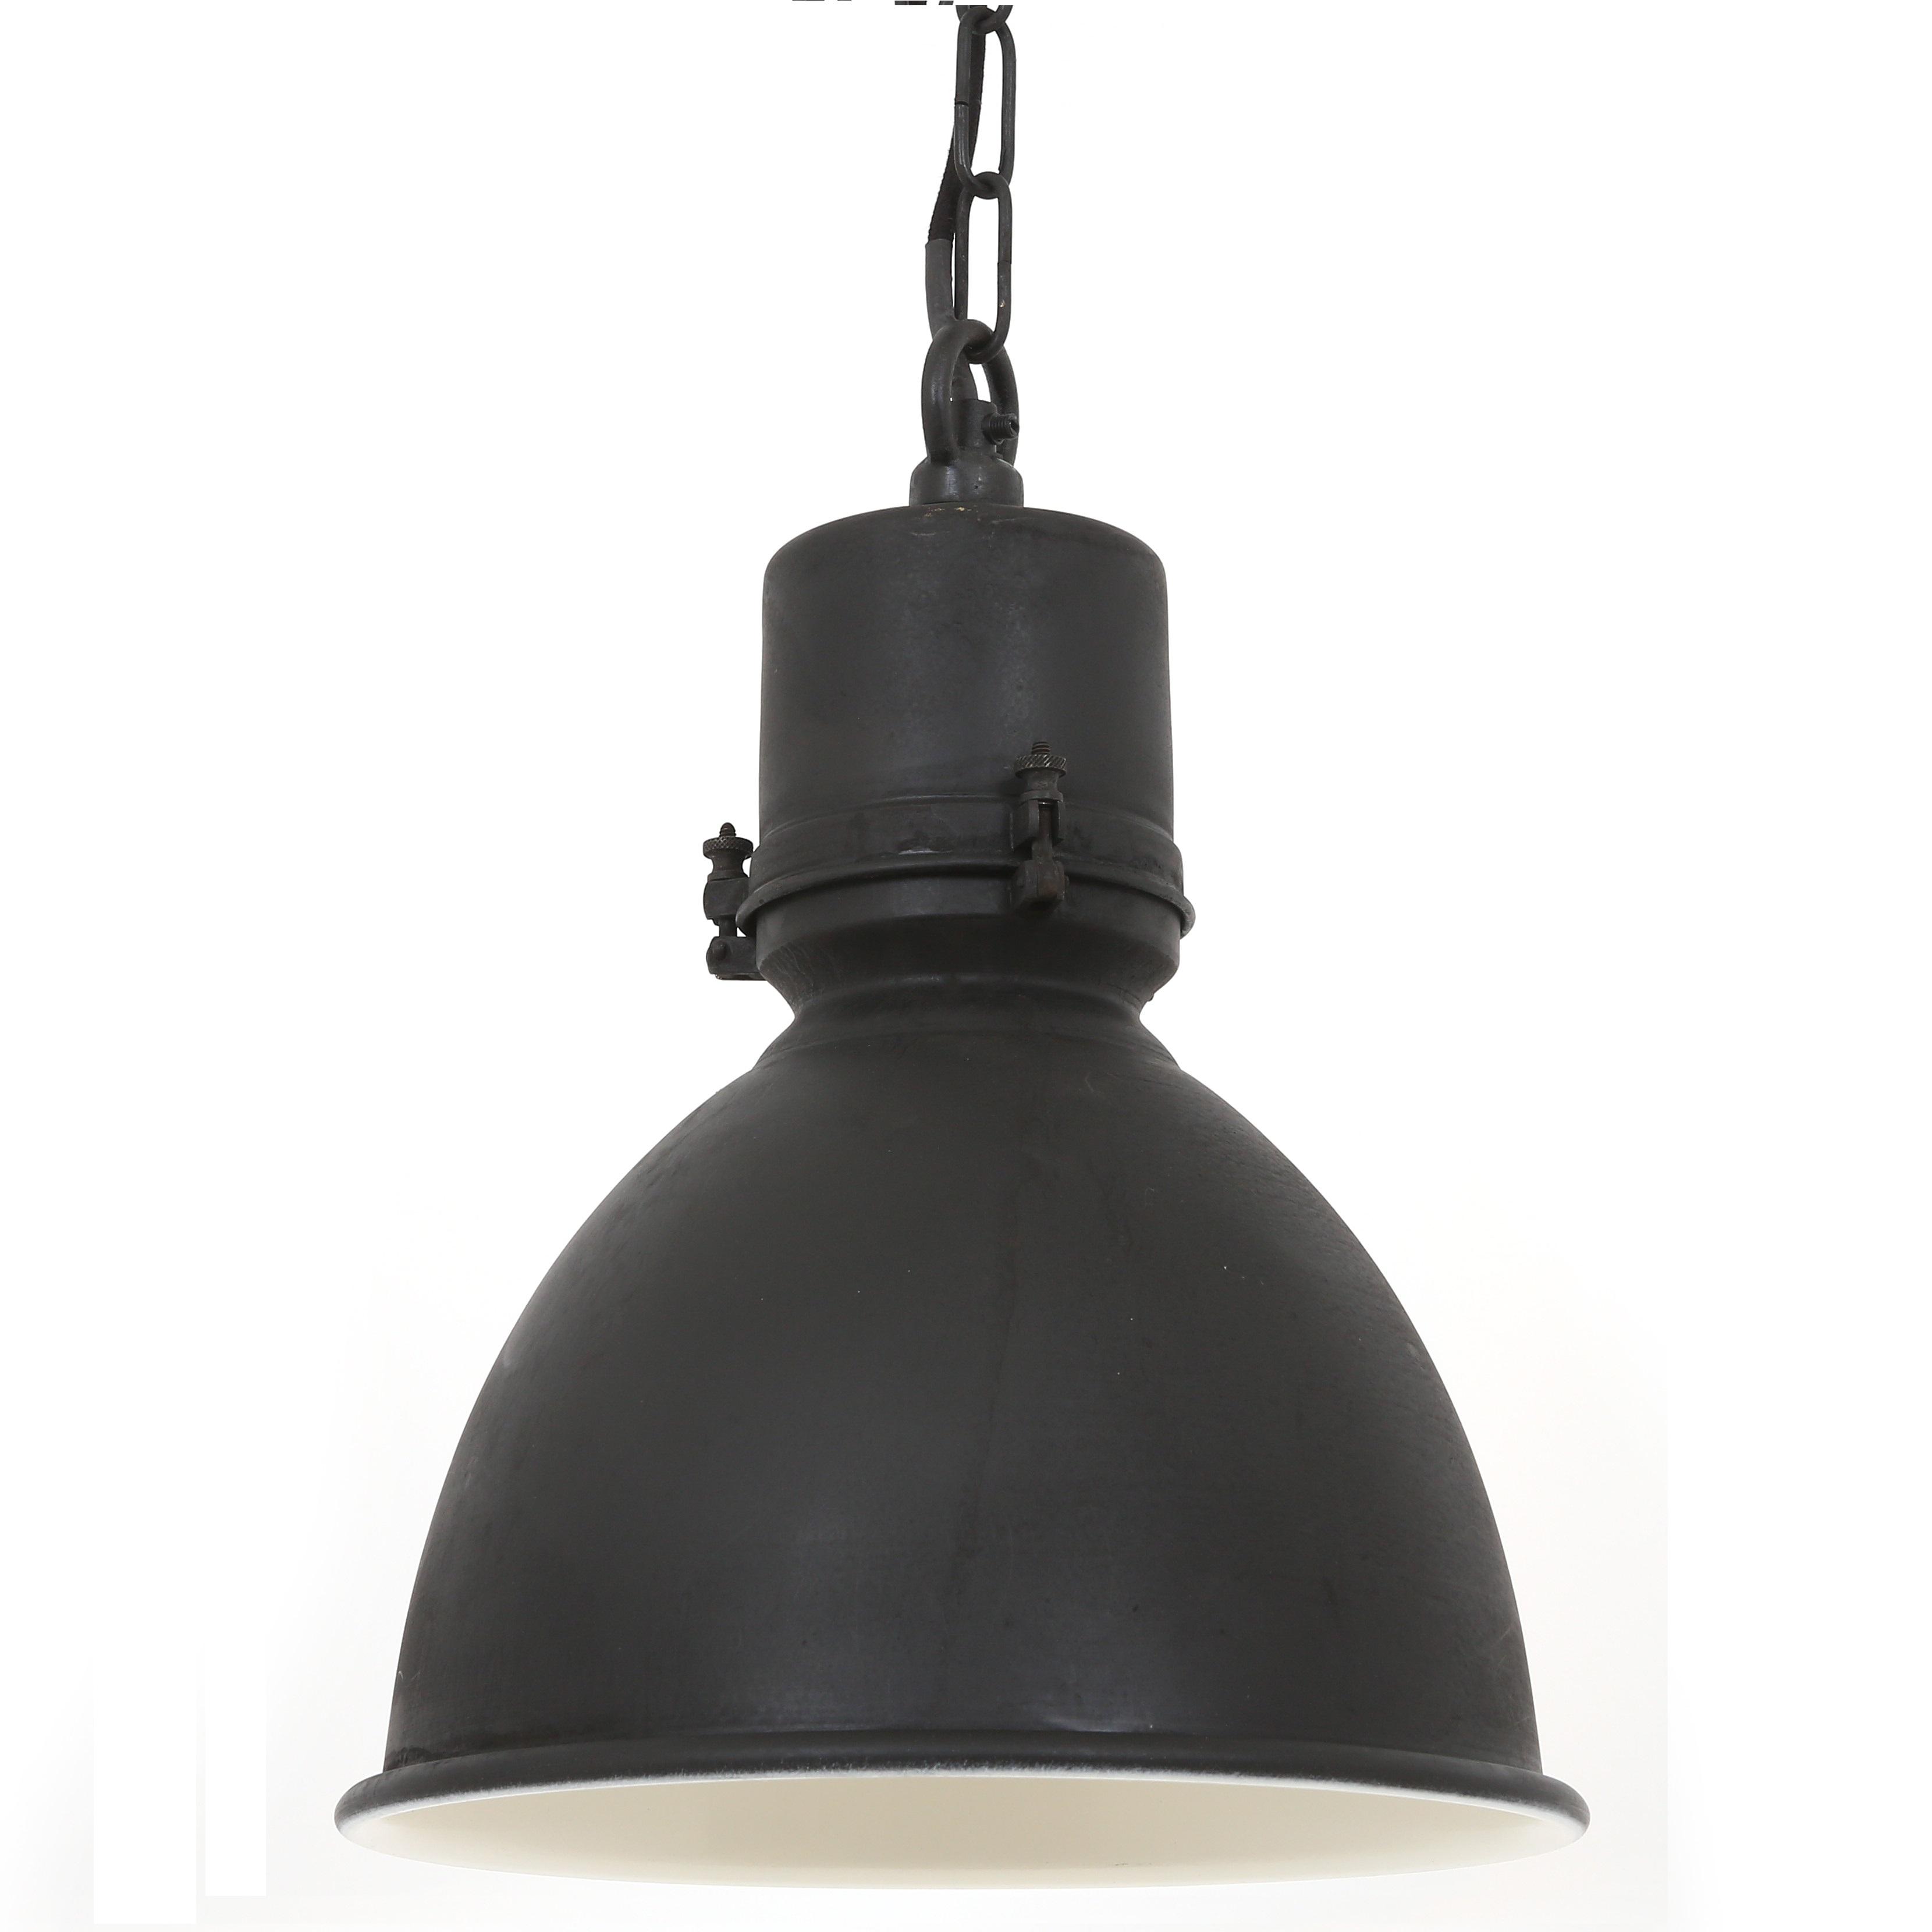 Industriele Hanglamp Keuken : Fabriekslamp Zwart kopen? Online op Stoerelampen.nl